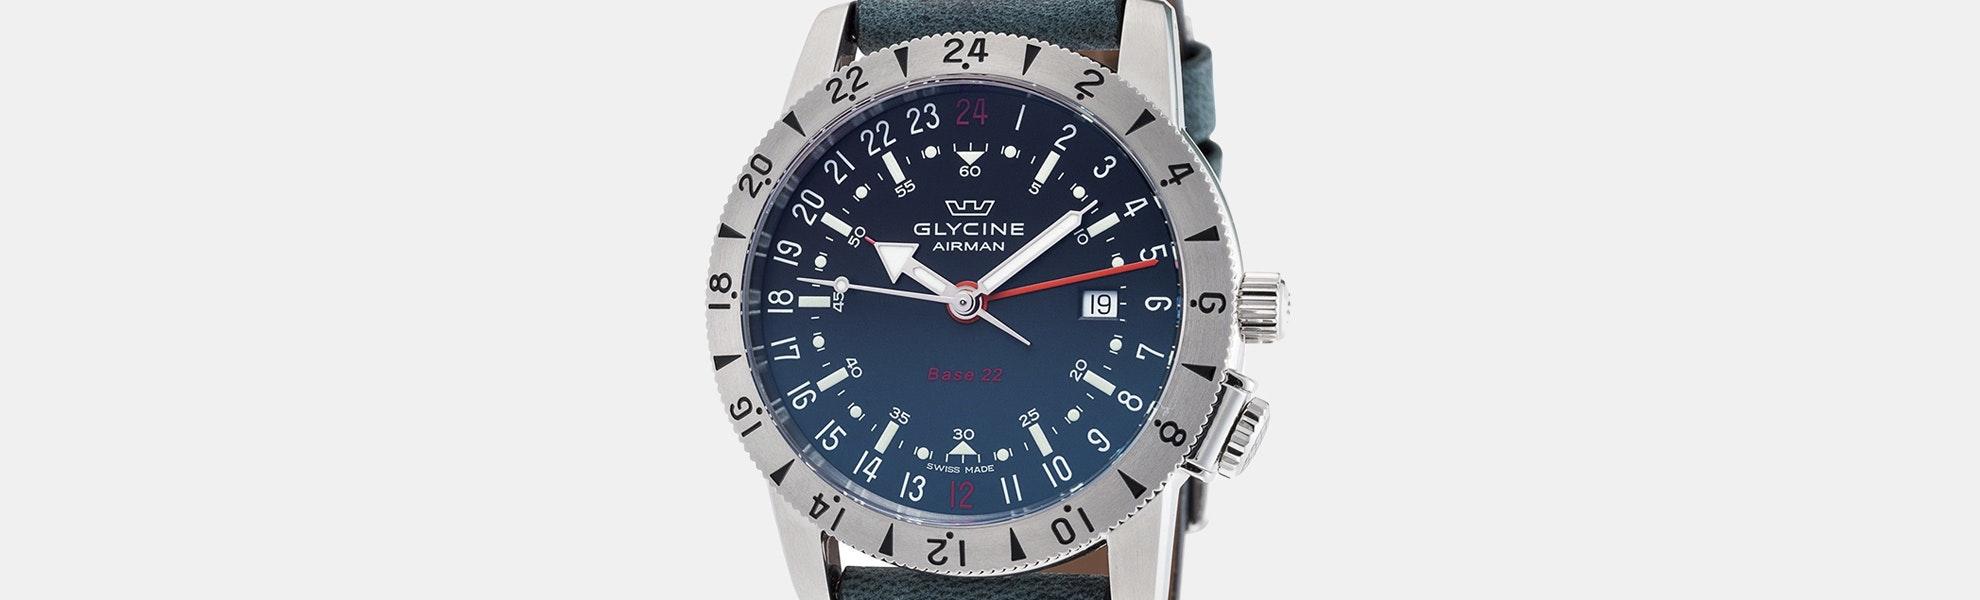 Glycine Airman Base 22 Automatic Watch